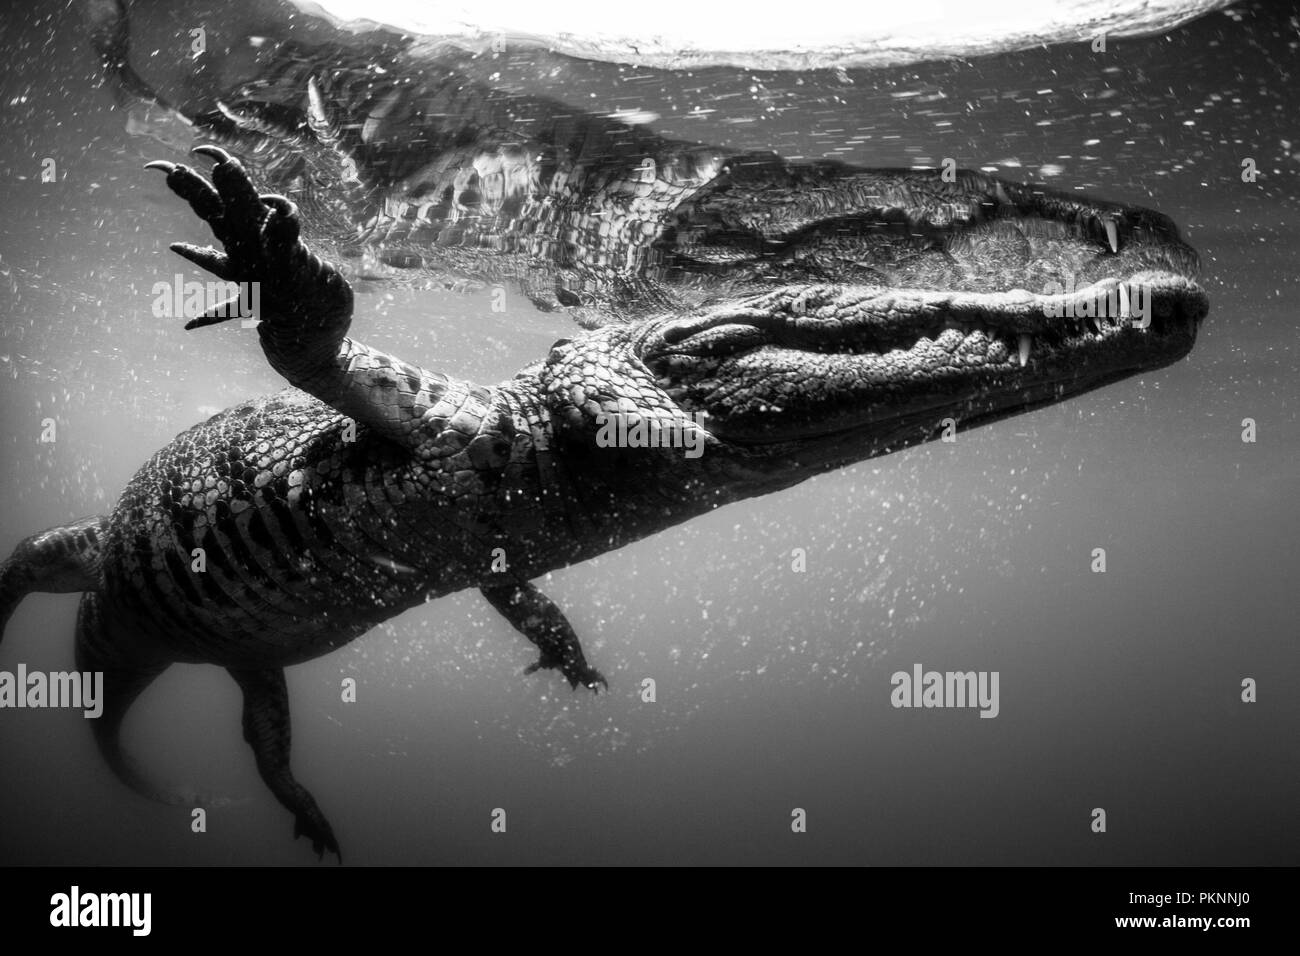 Morelet's Crocodile, Crocodylus moreletii, Cancun, Yucatan, Mexico - Stock Image